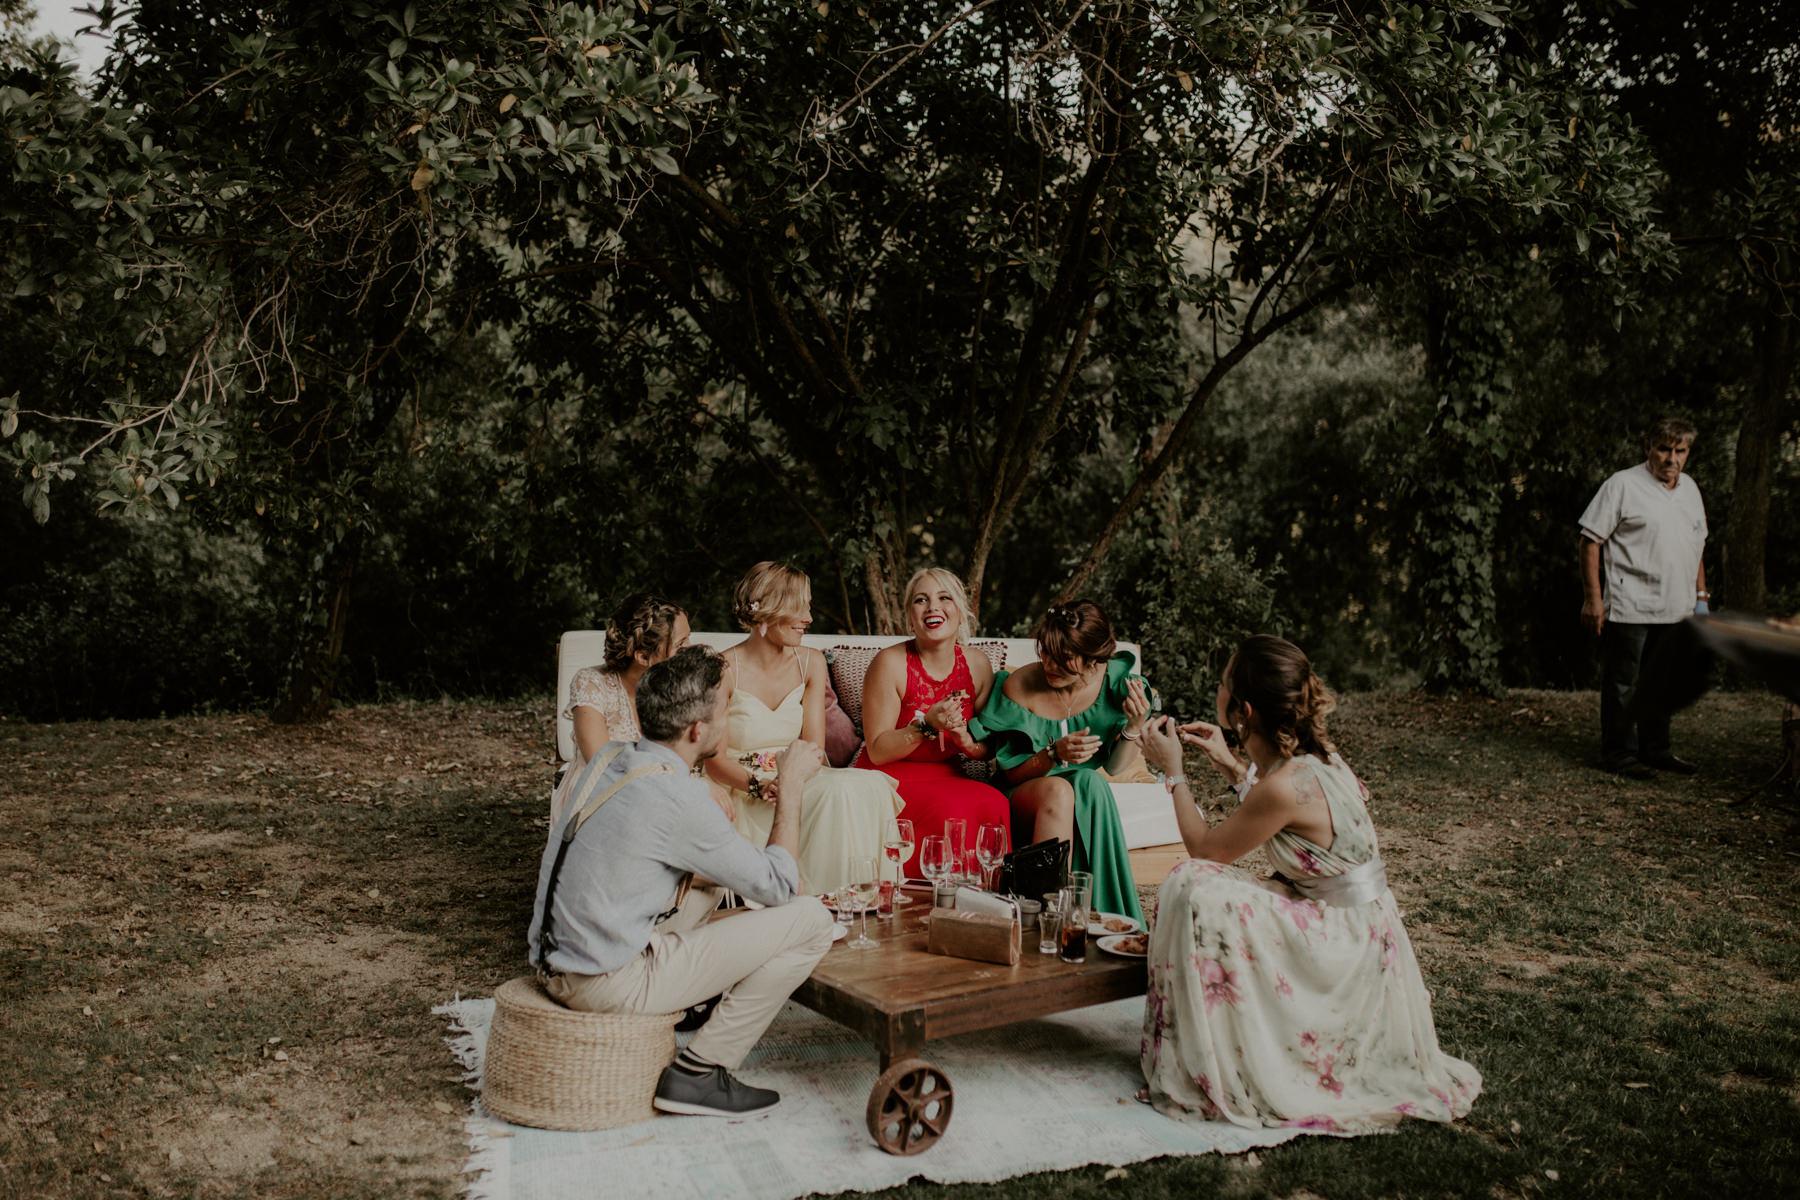 alt_thenortherngirlphotography_couples_weddingphotographer_photographer_wedding_boda_fotografodebodas_fotografobodasbarcelona_bodaindie_bodasconestilo_bodaensantperedeclara_jennifermiguel-587.jpg